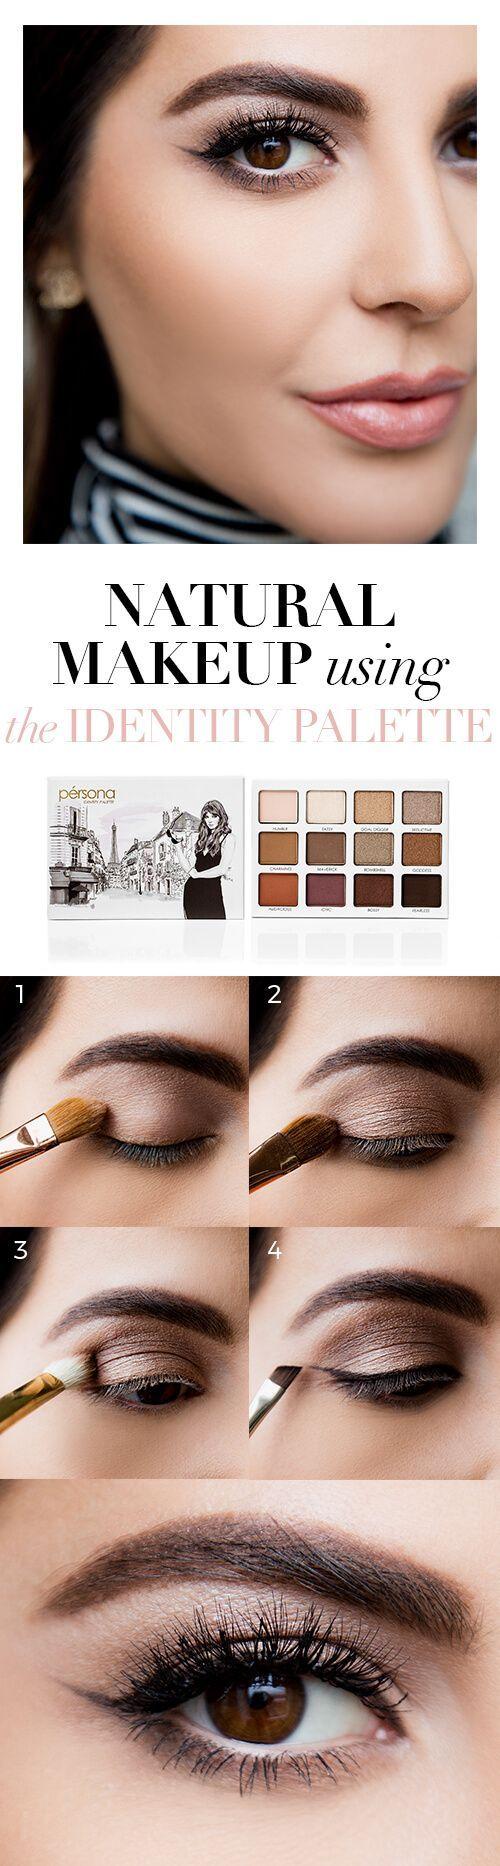 Sona Gasparian's Natural Eye Makeup Tutorial using the Pérsona Cosmetics Identity Palette